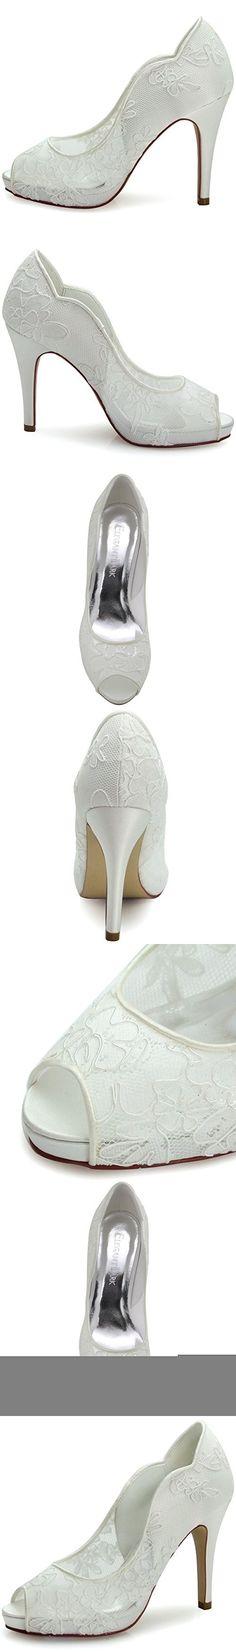 Elegantpark HP1504I Women's Peep Toe Wave Edge Platform Stiletto Lace  Wedding Bridal Evening Pumps Shoes Ivory